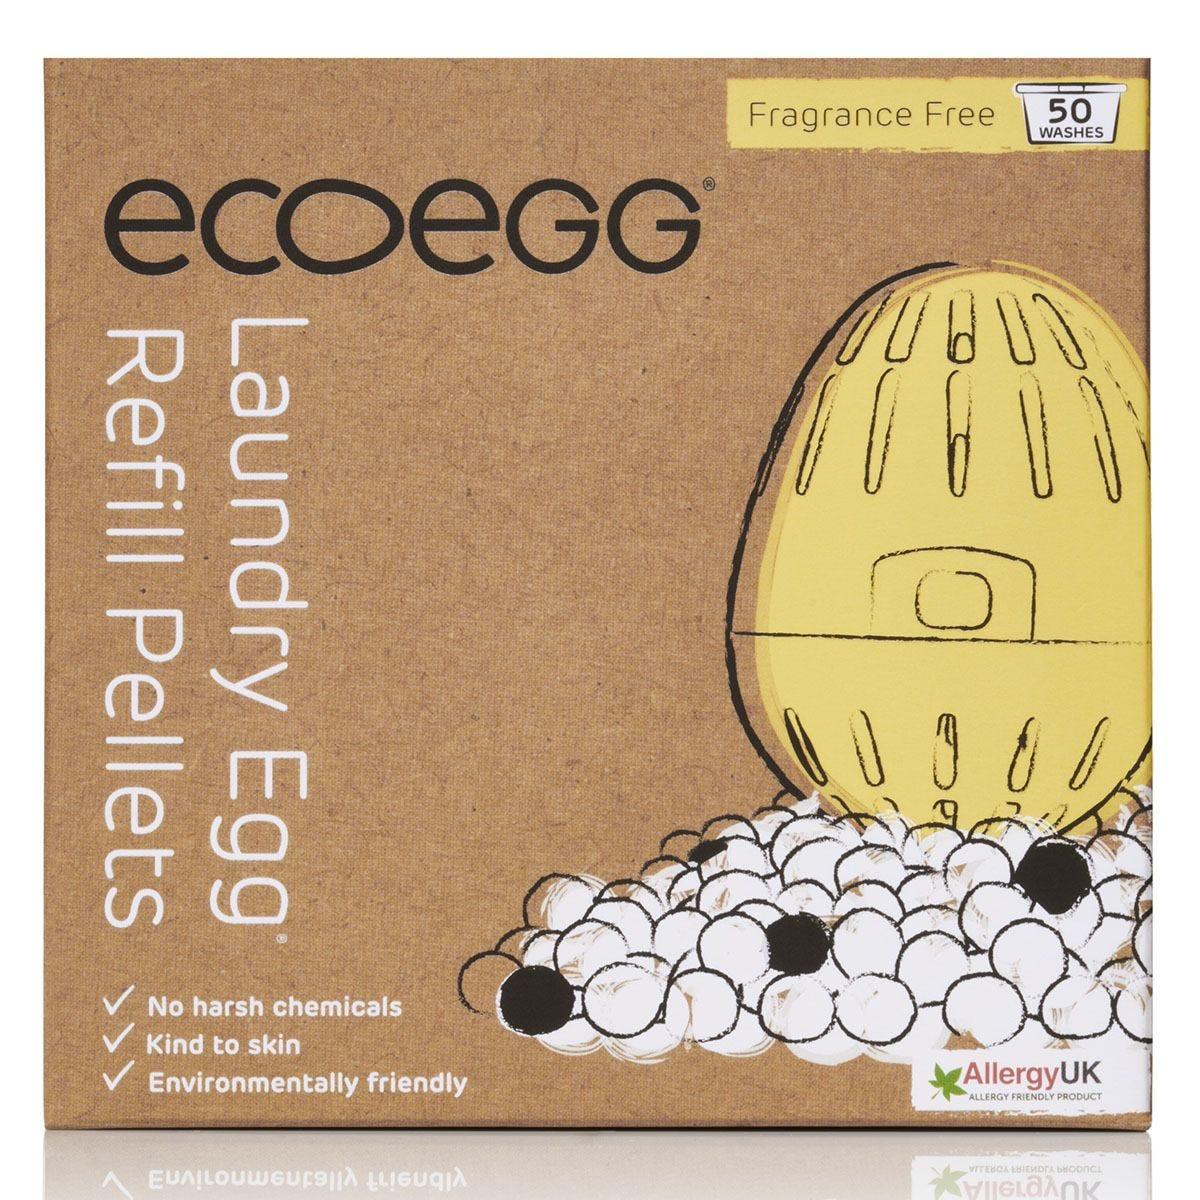 Ecoegg Fragrance Free Laundry Egg Refill Pellets - 50 Washes